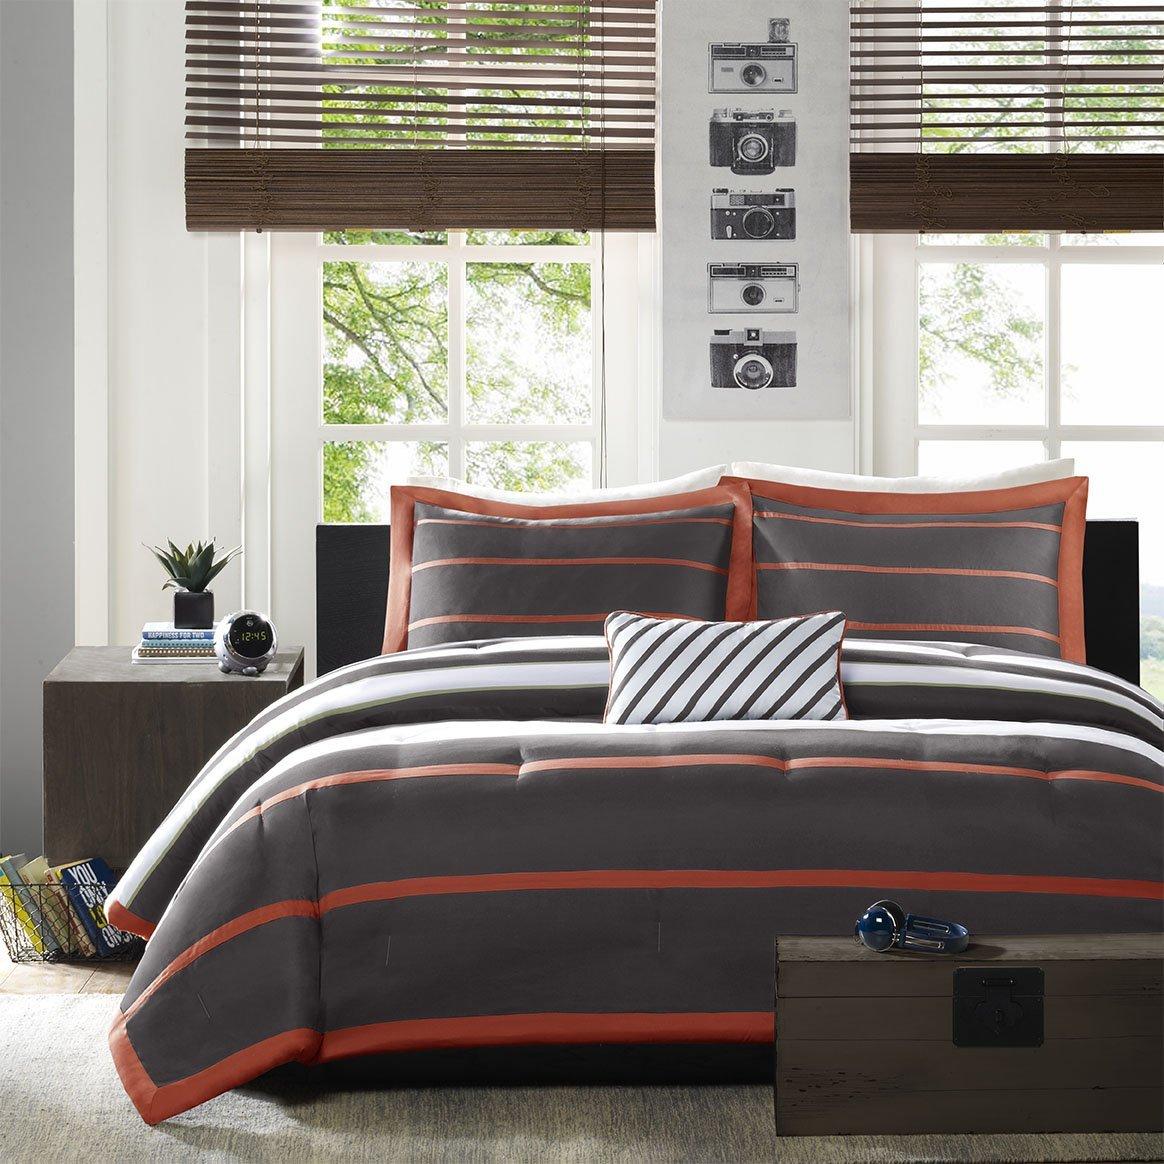 total fab midcentury modern bedding sets - medcentury modern bedding set orange and grey block pattern